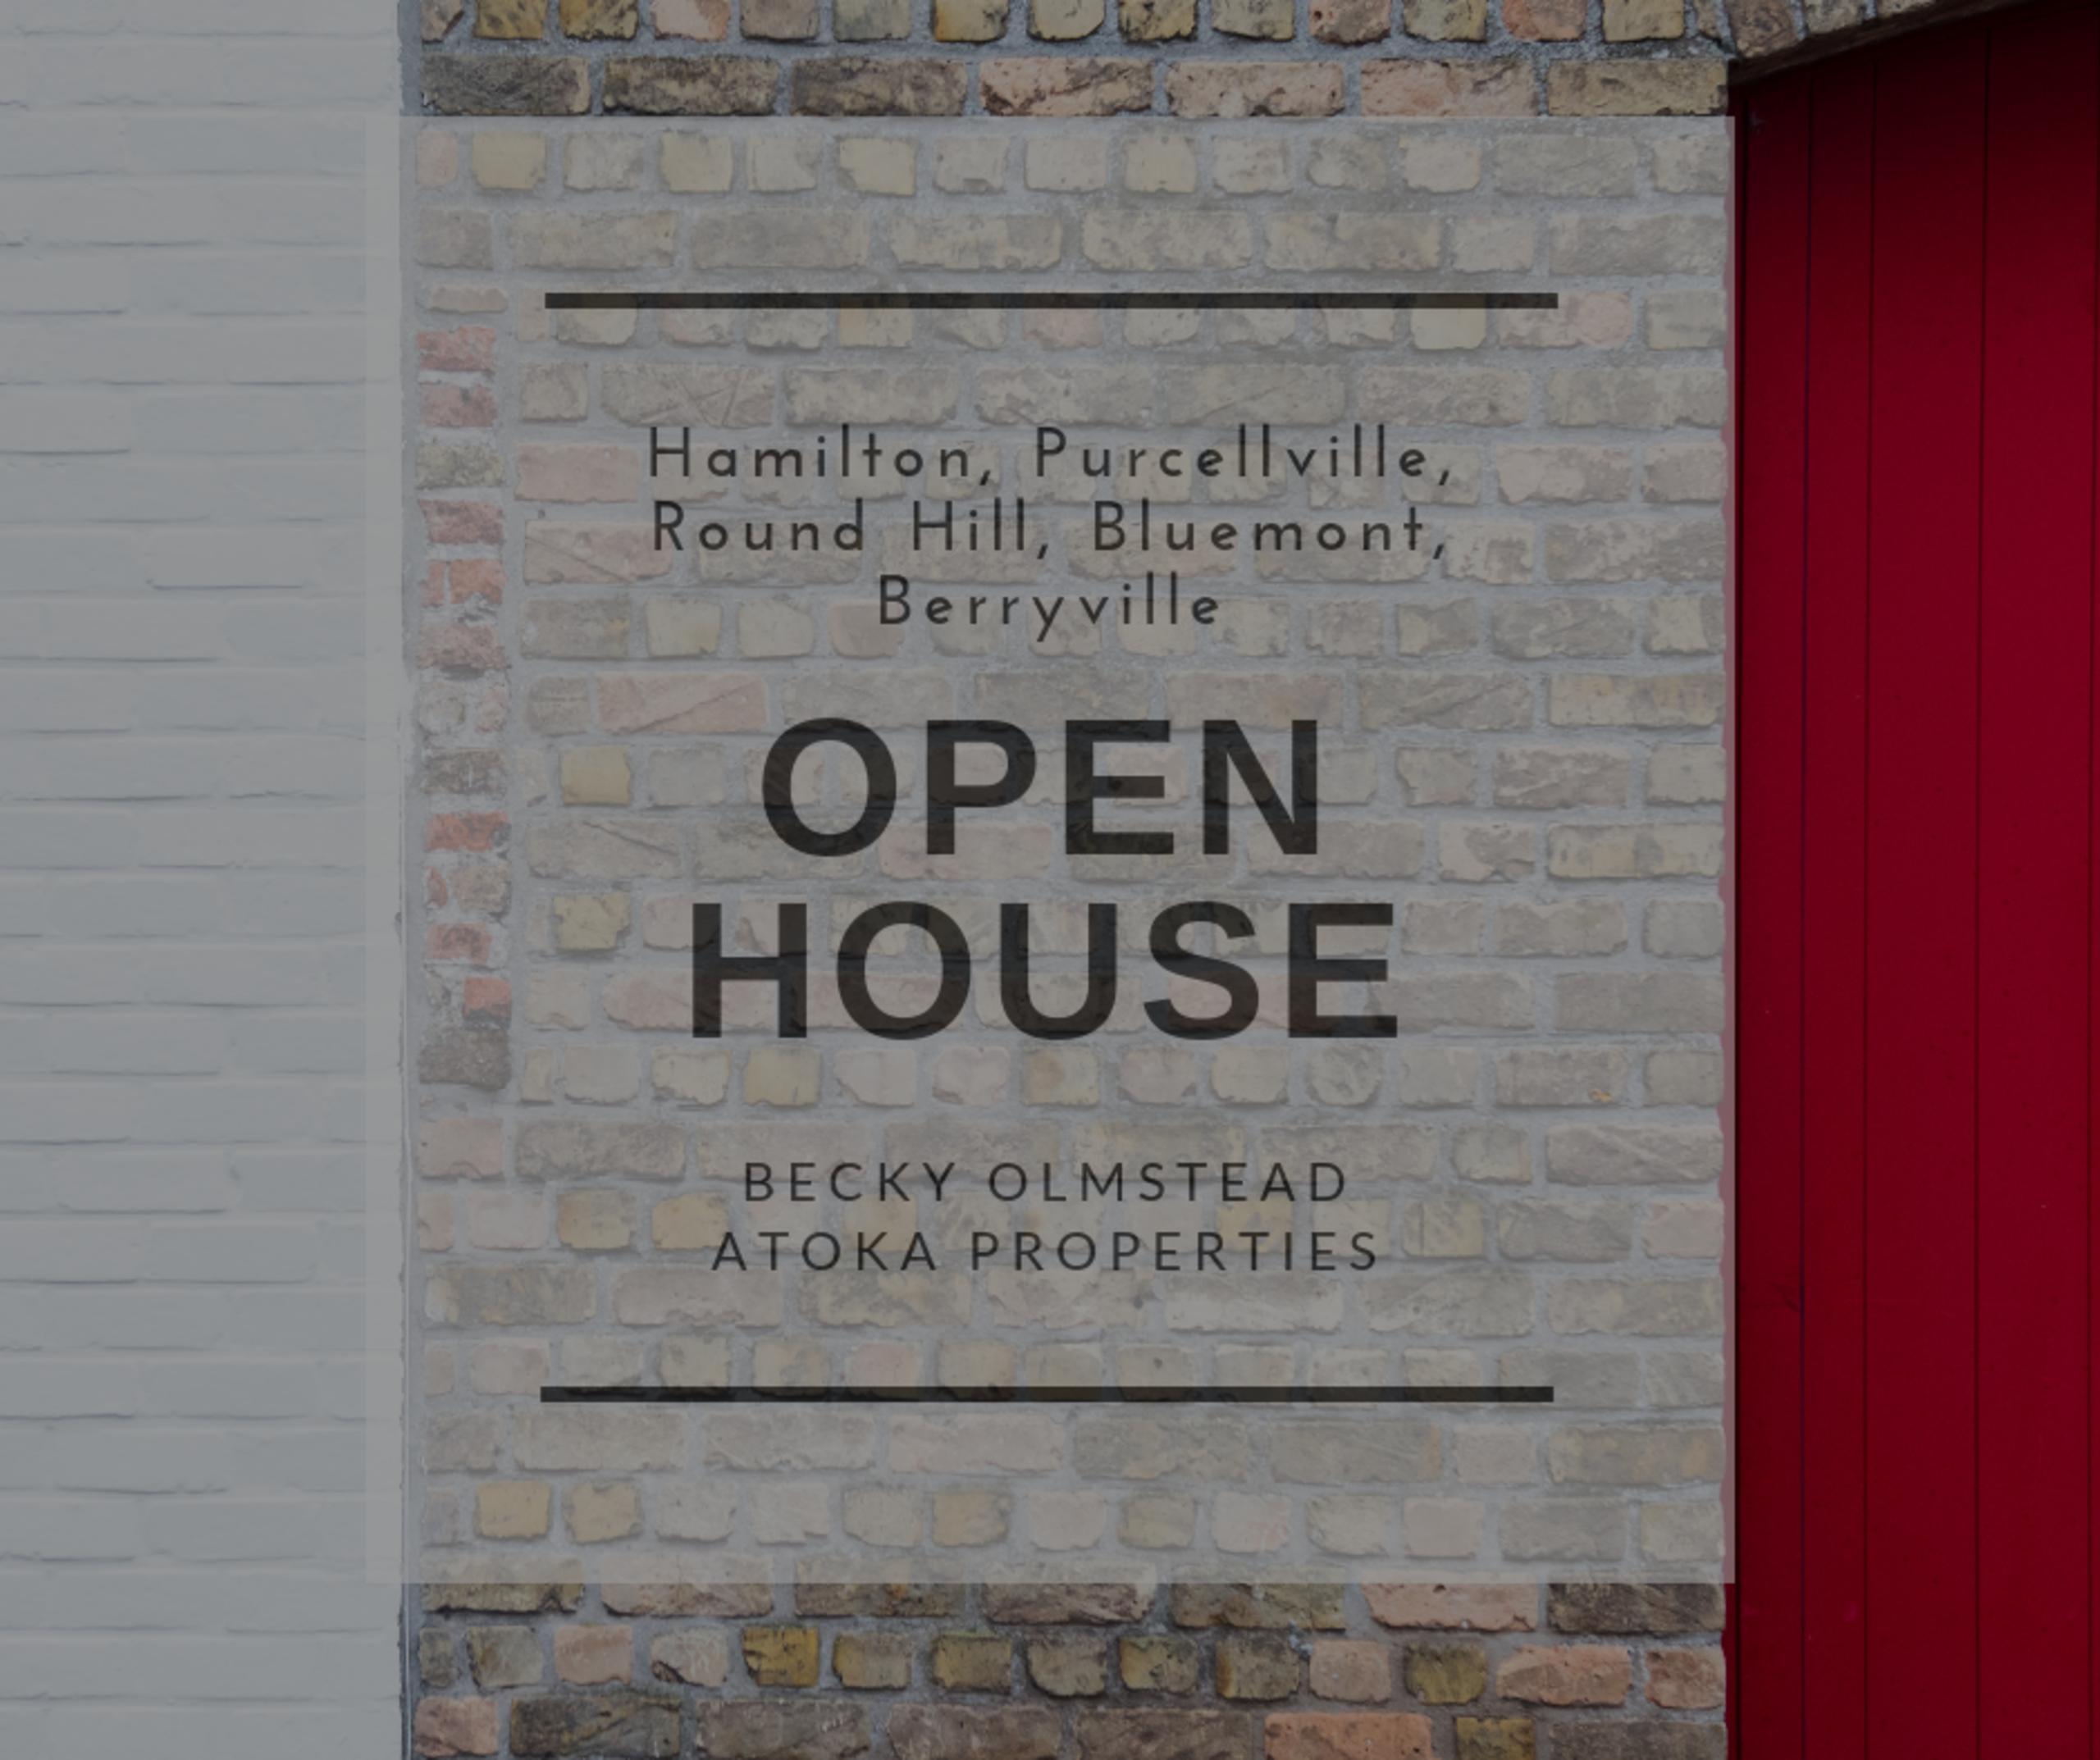 Open House 10/10/18 – 10/11/18